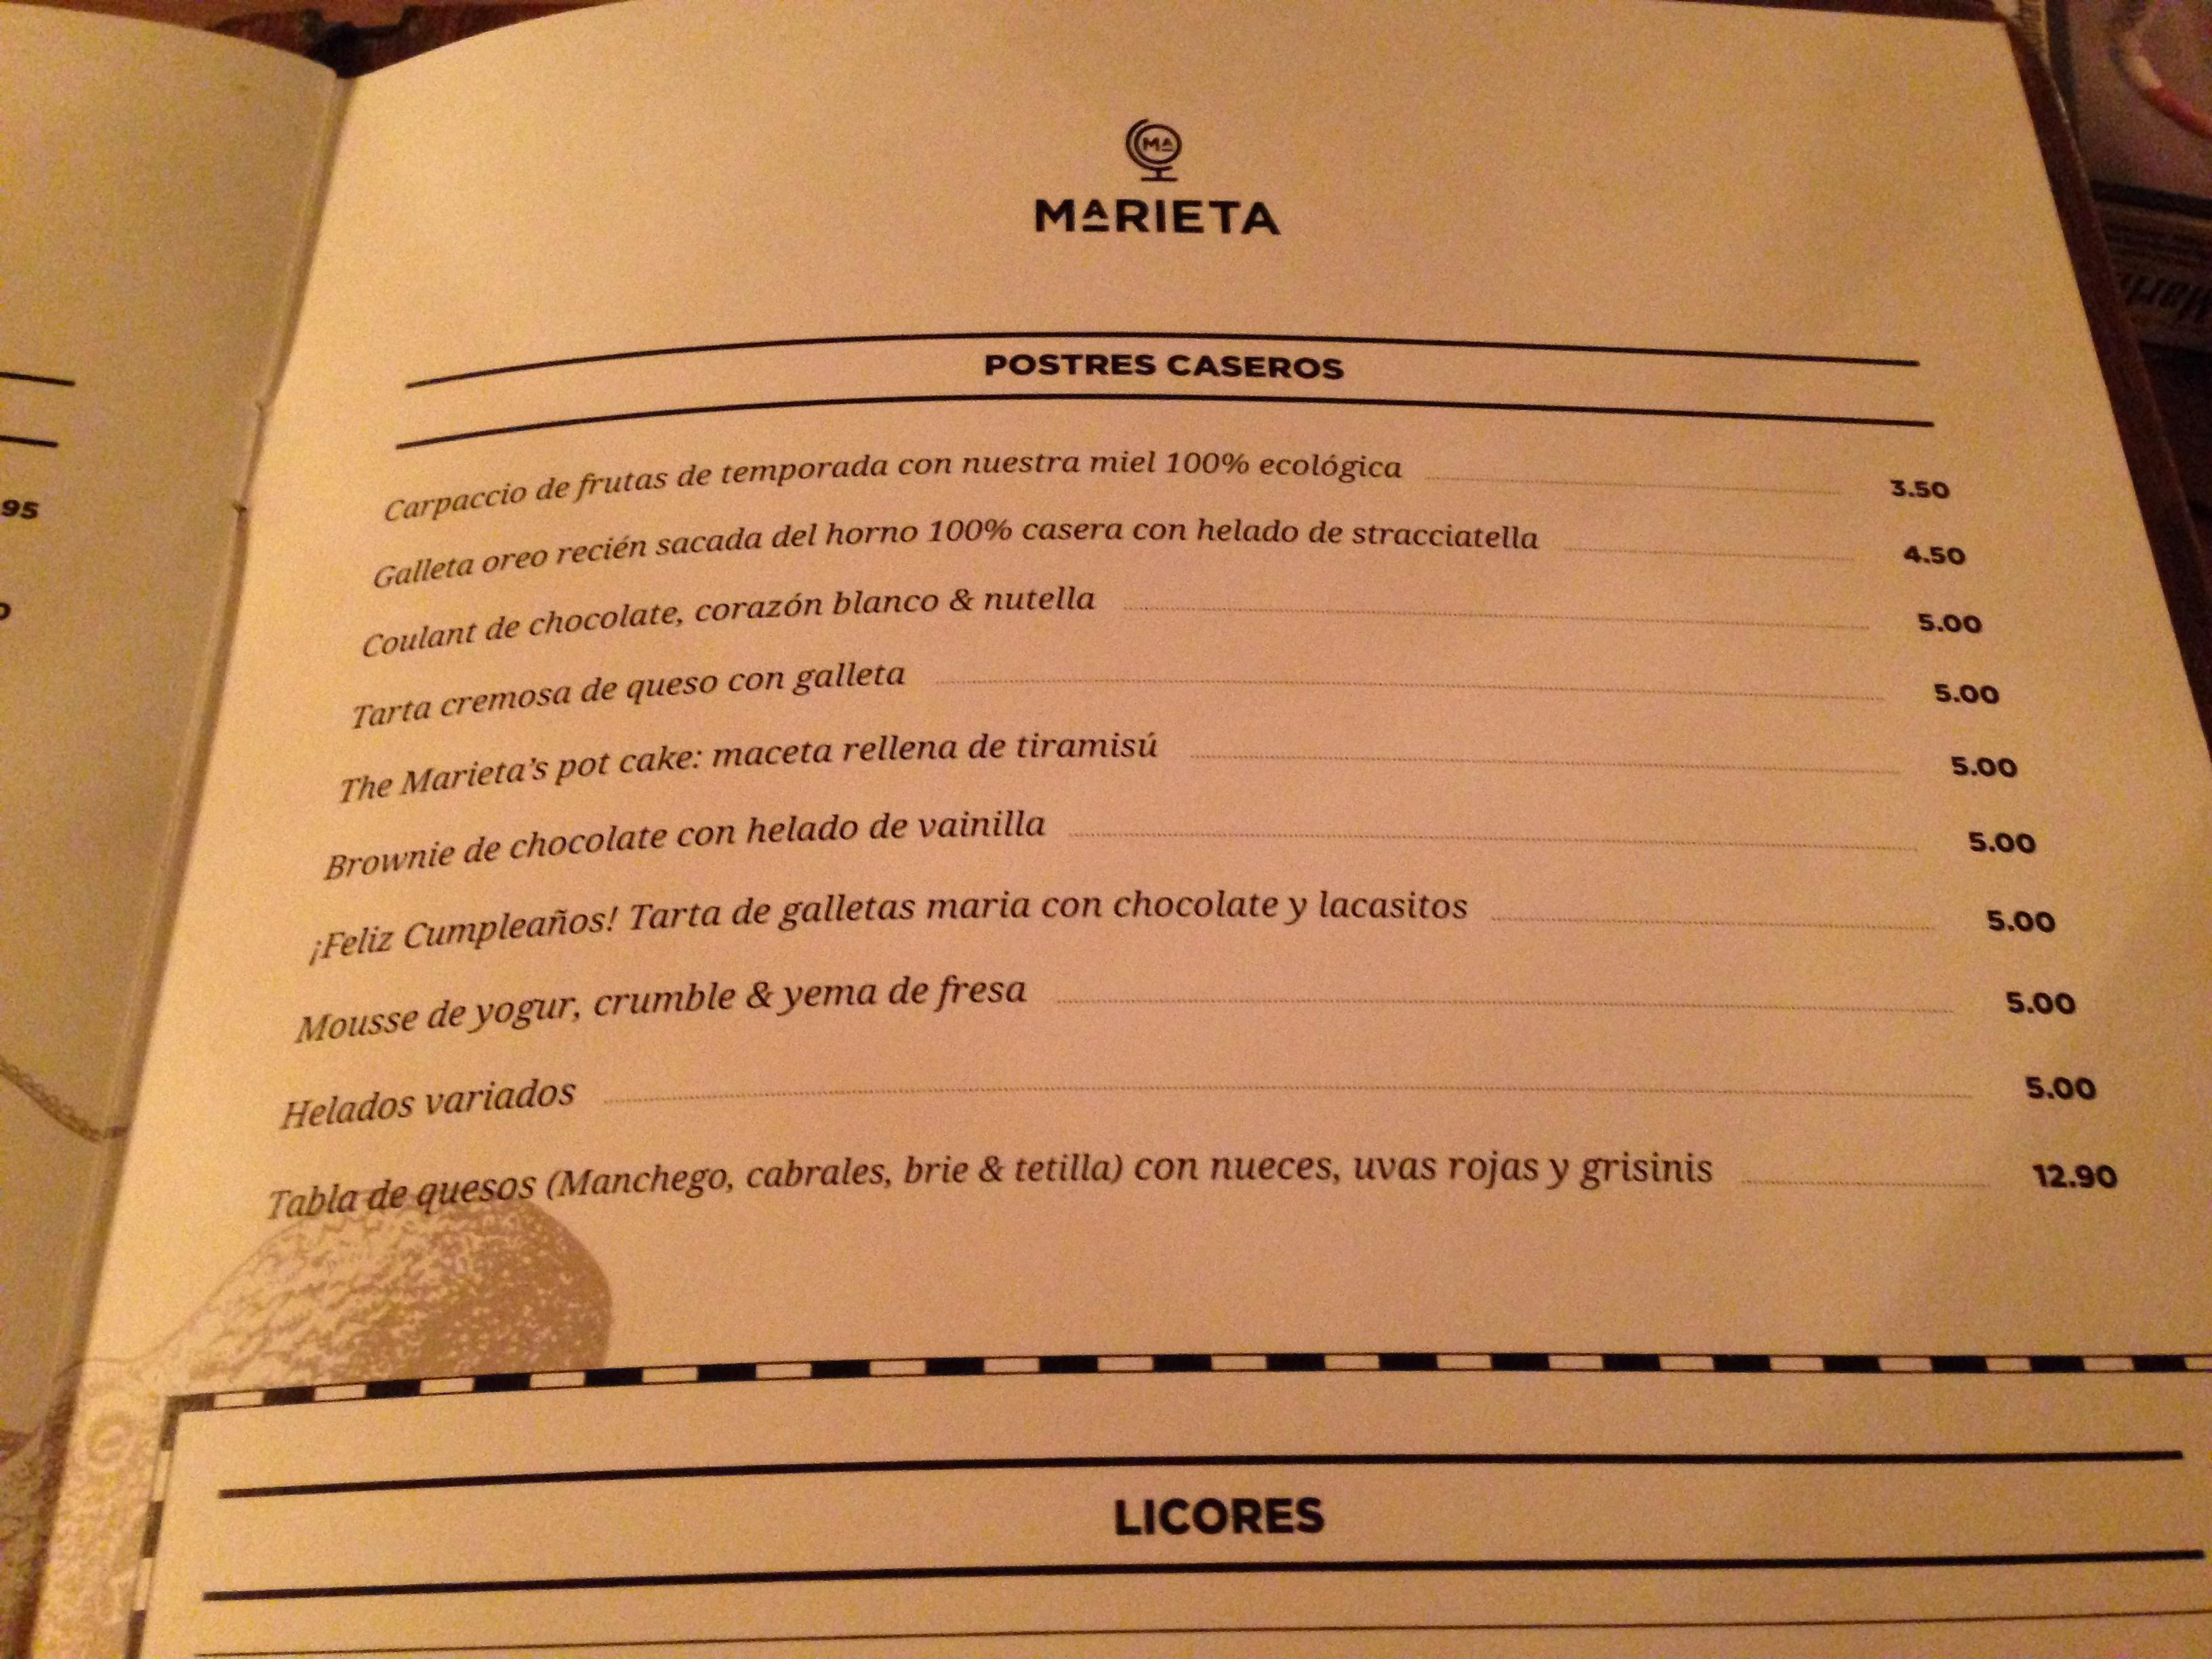 Marieta carta 7 dime un restaurante - La marieta madrid ...